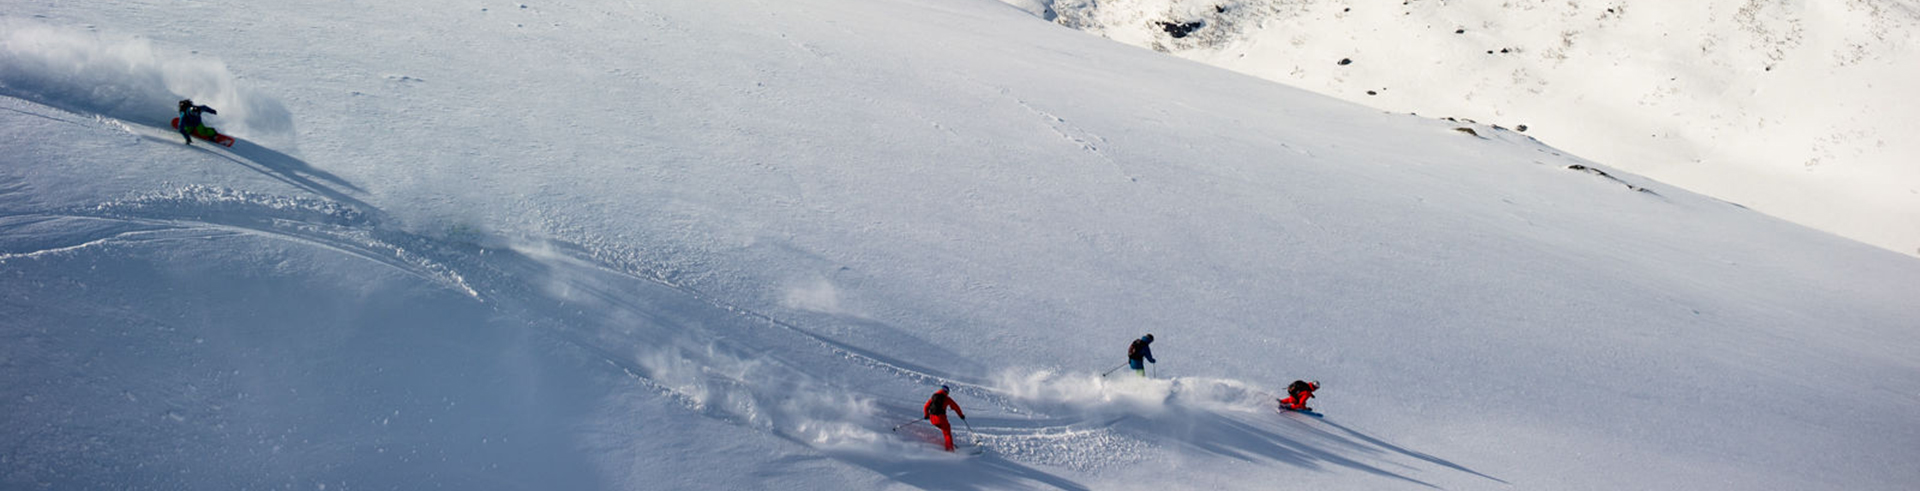 skidåkare